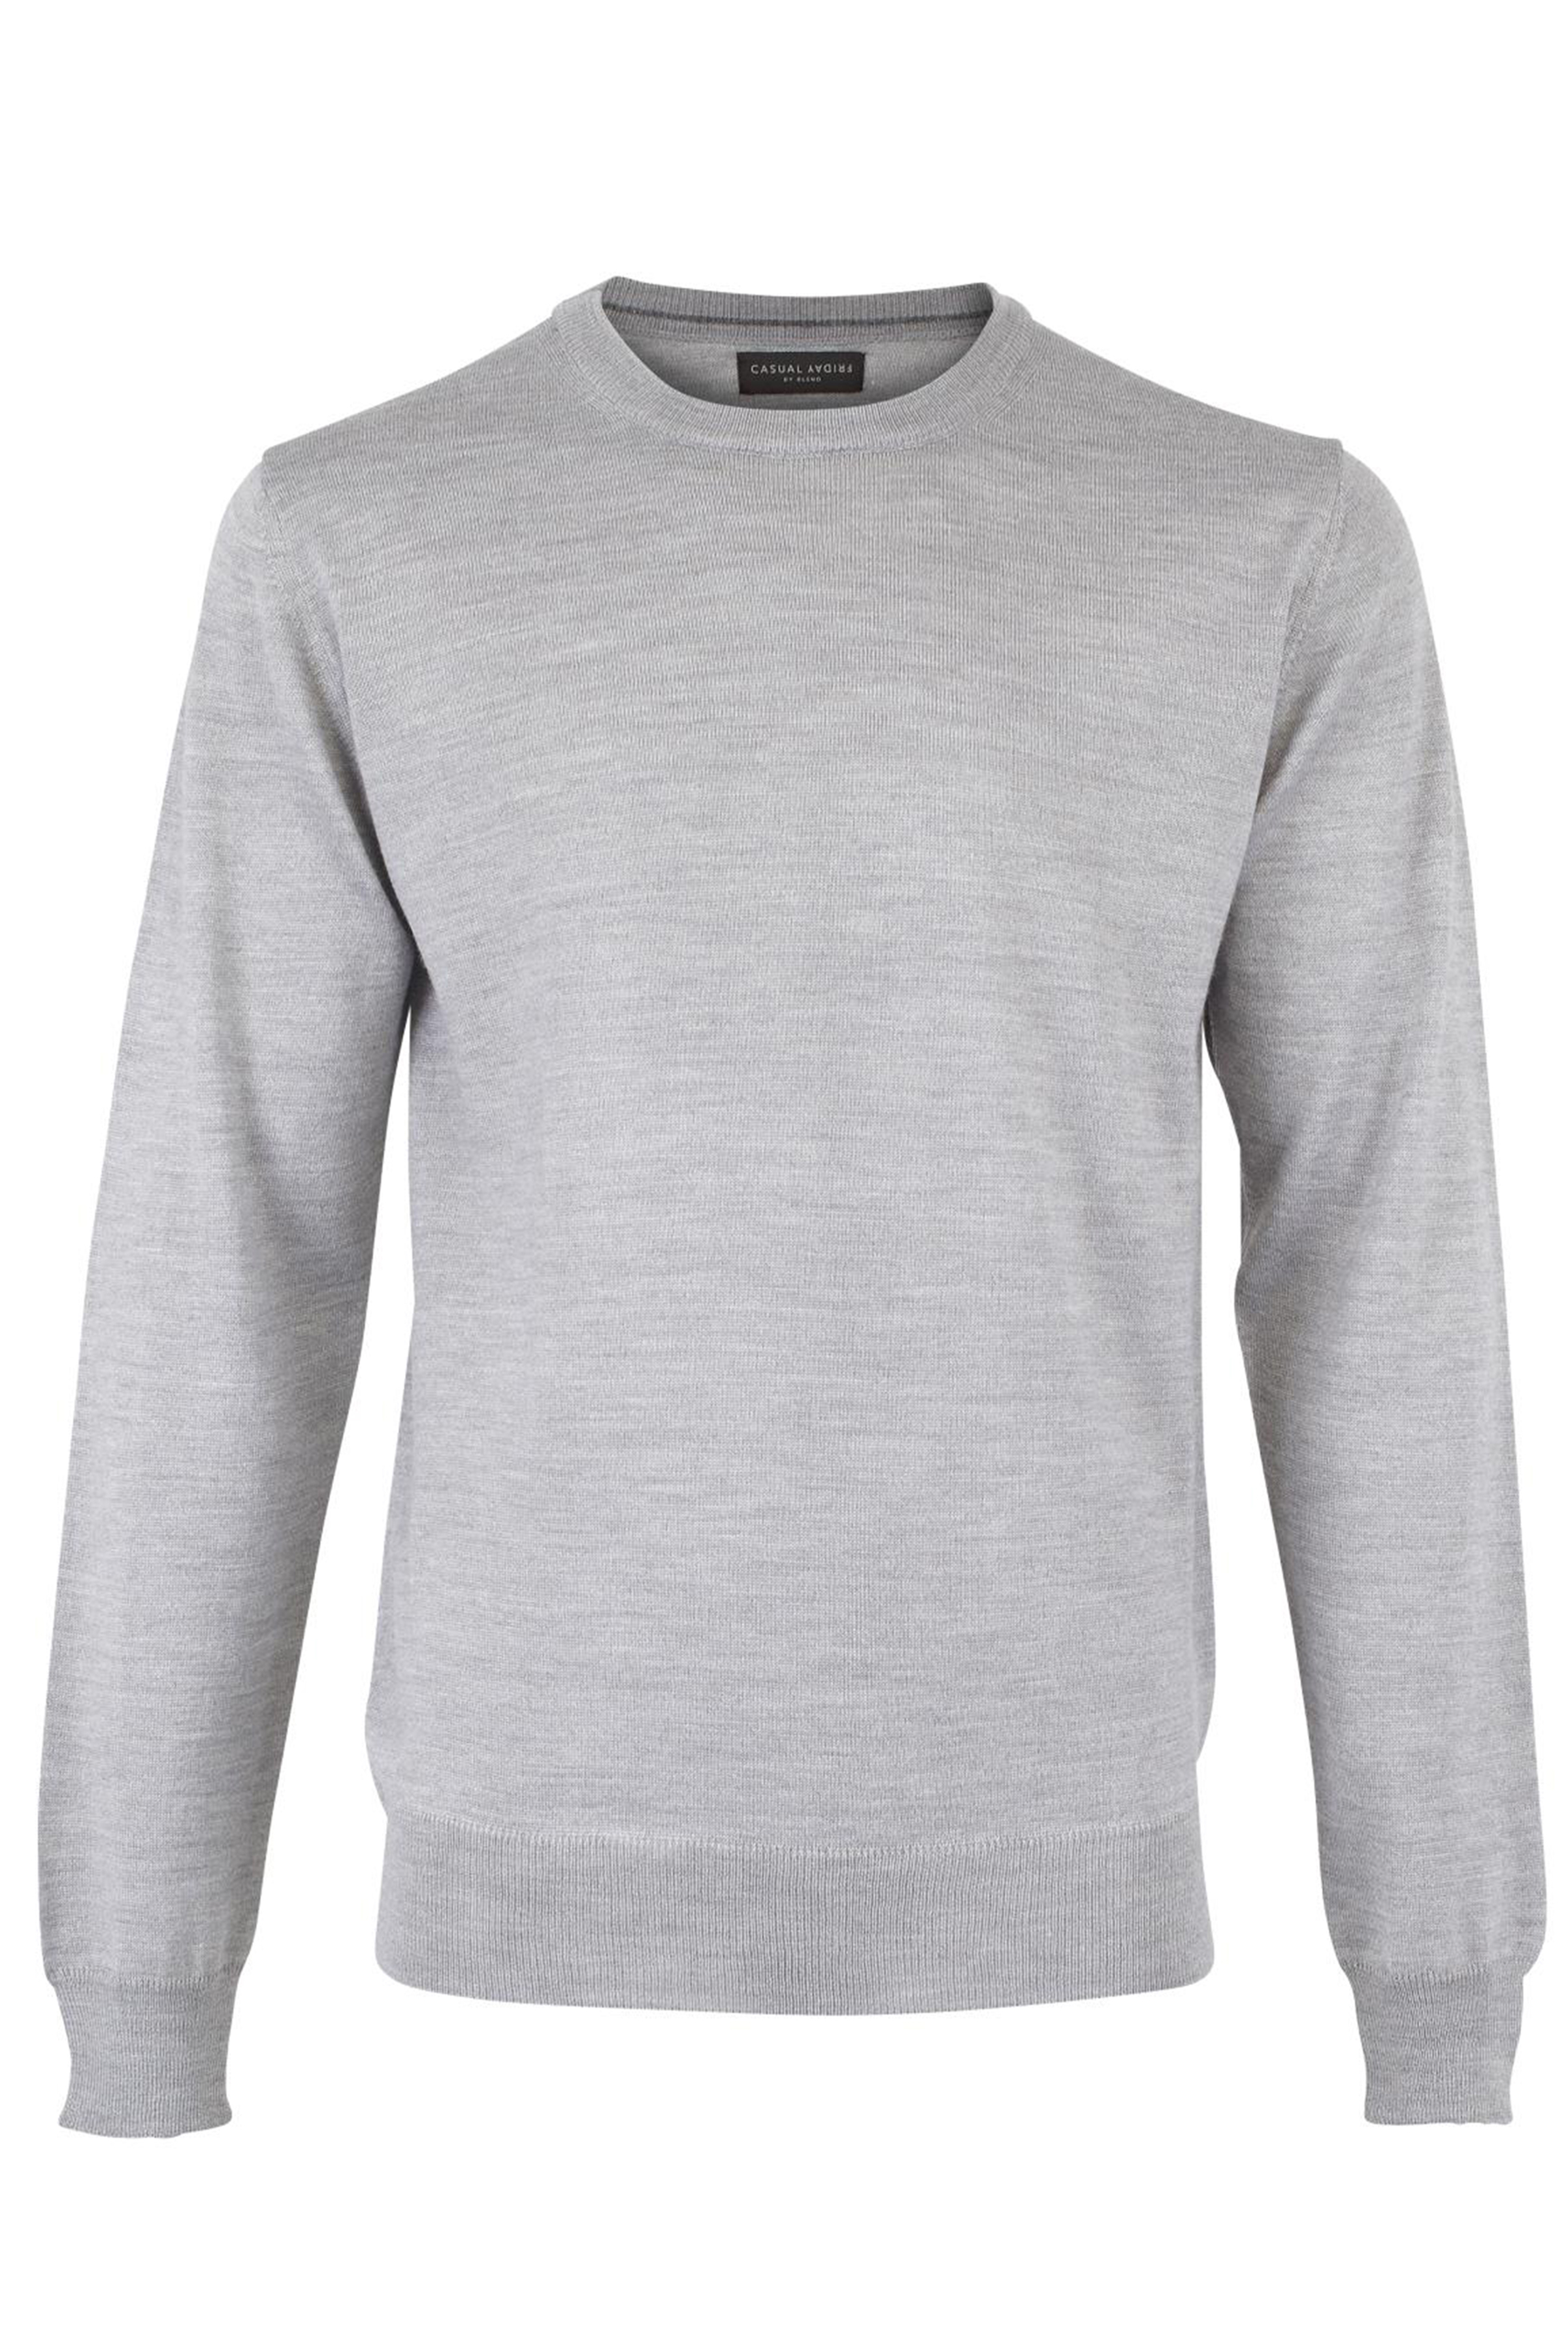 Light grey melange Strikpullover fra Casual Friday – Køb Light grey melange Strikpullover fra str. S-XXL her